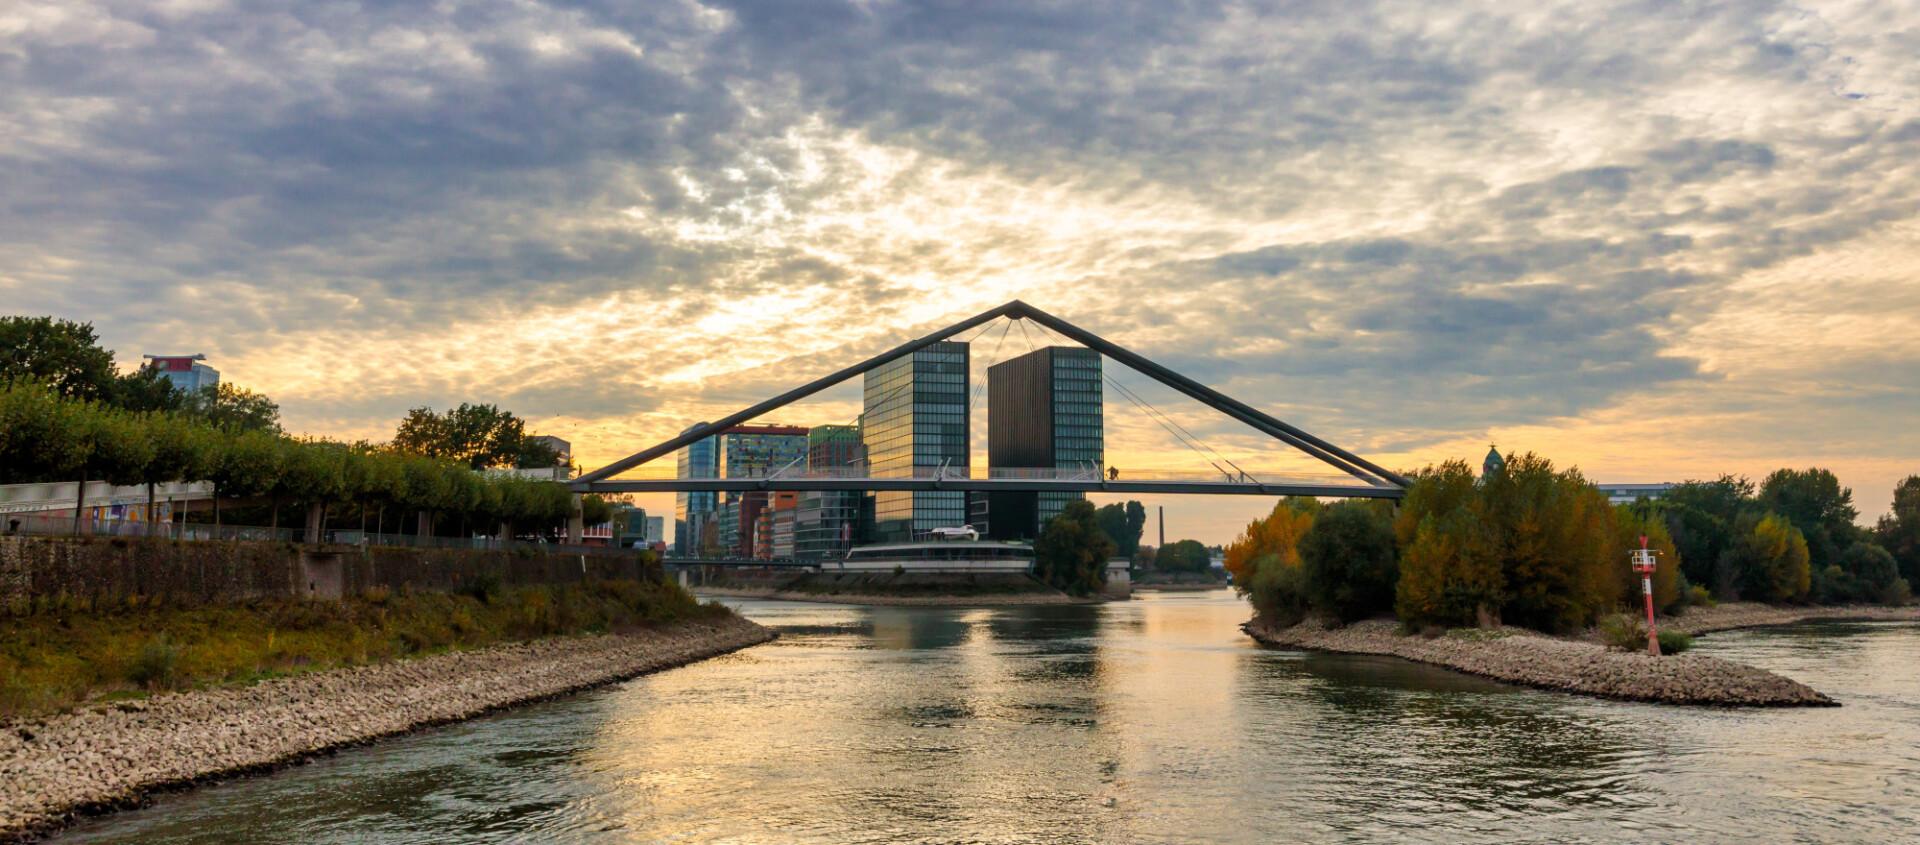 Dusseldorf on the Rhine ship crosses bridge